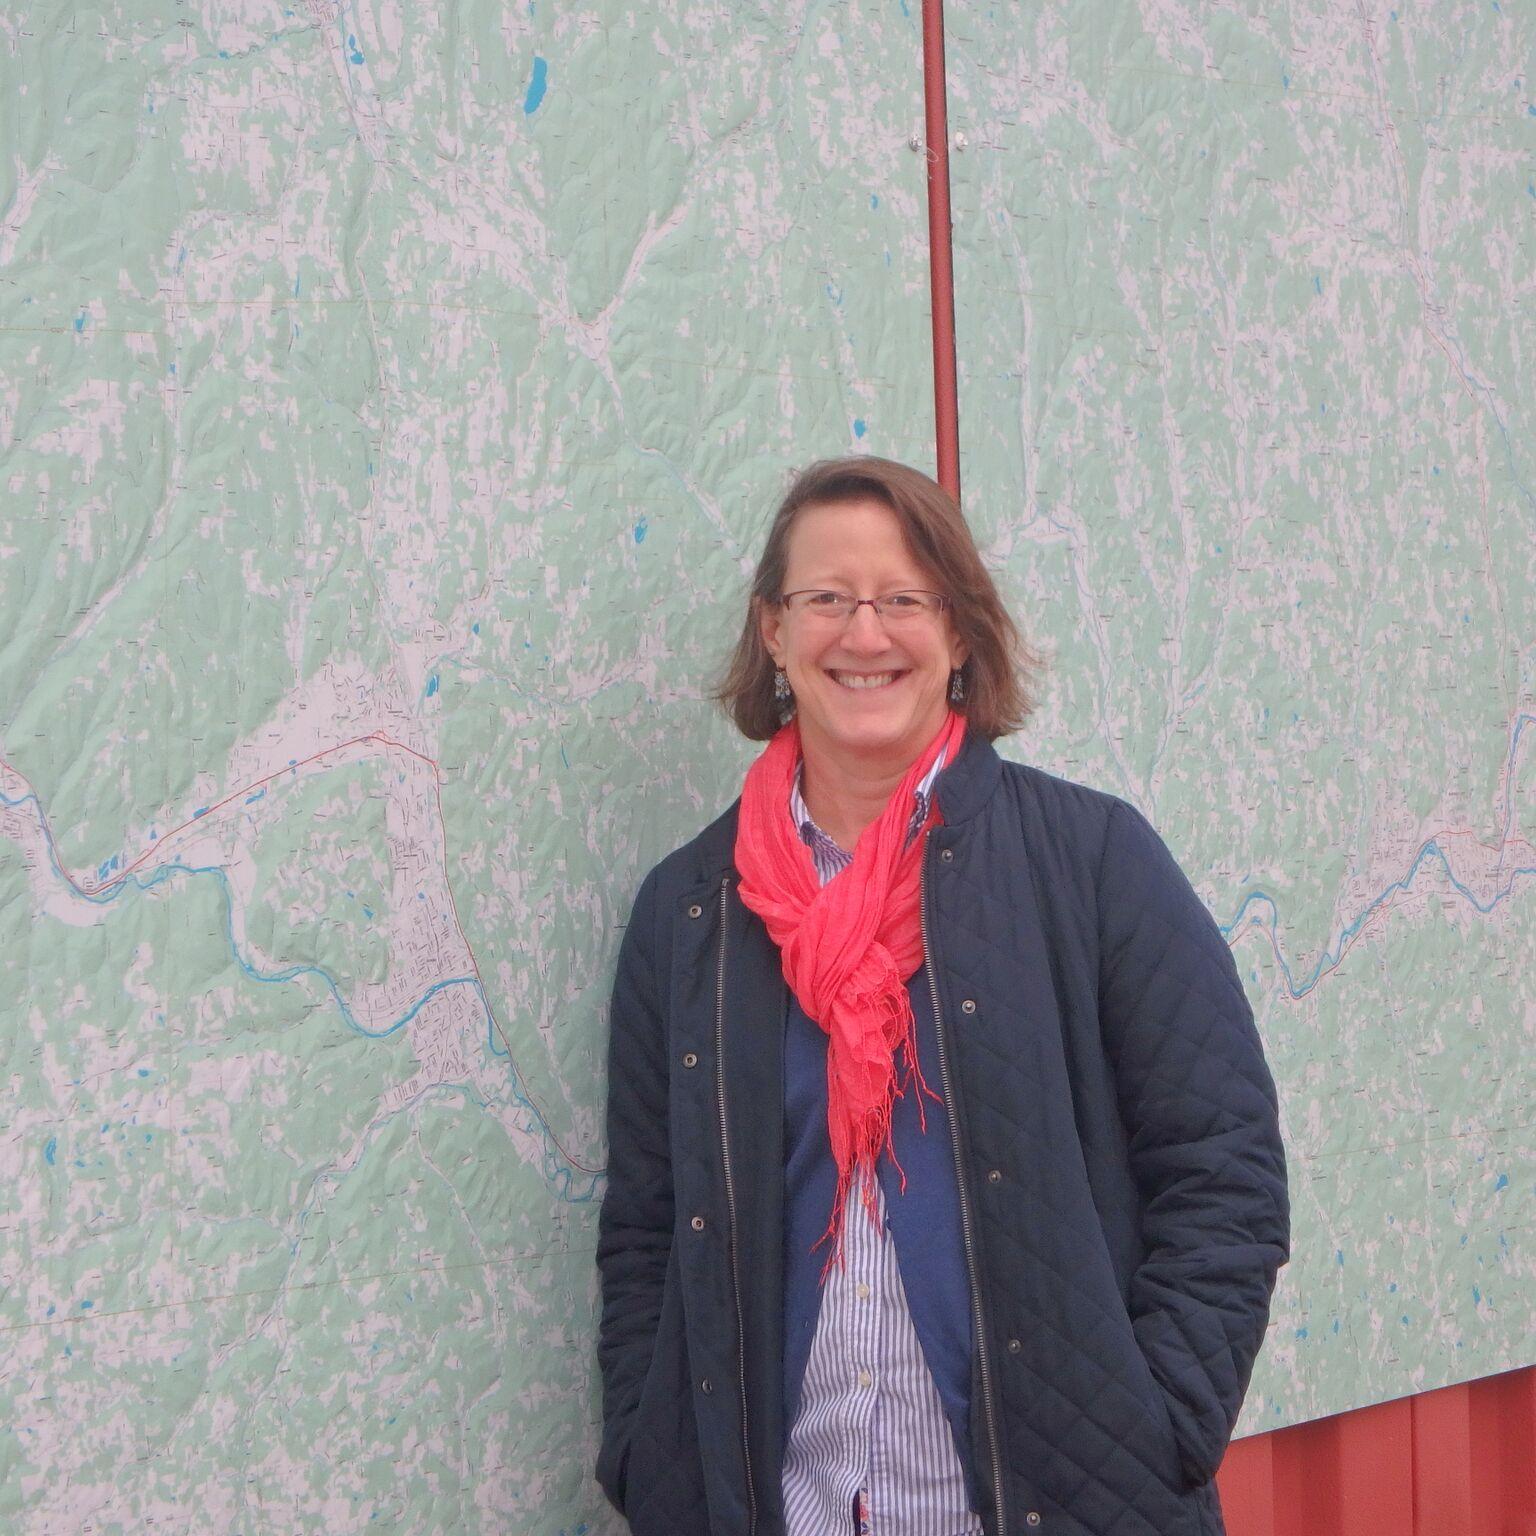 Diana Sinton, Mapmaker, GIS Expert, Un iversity Consortium of Geospatial Information Science coordinator